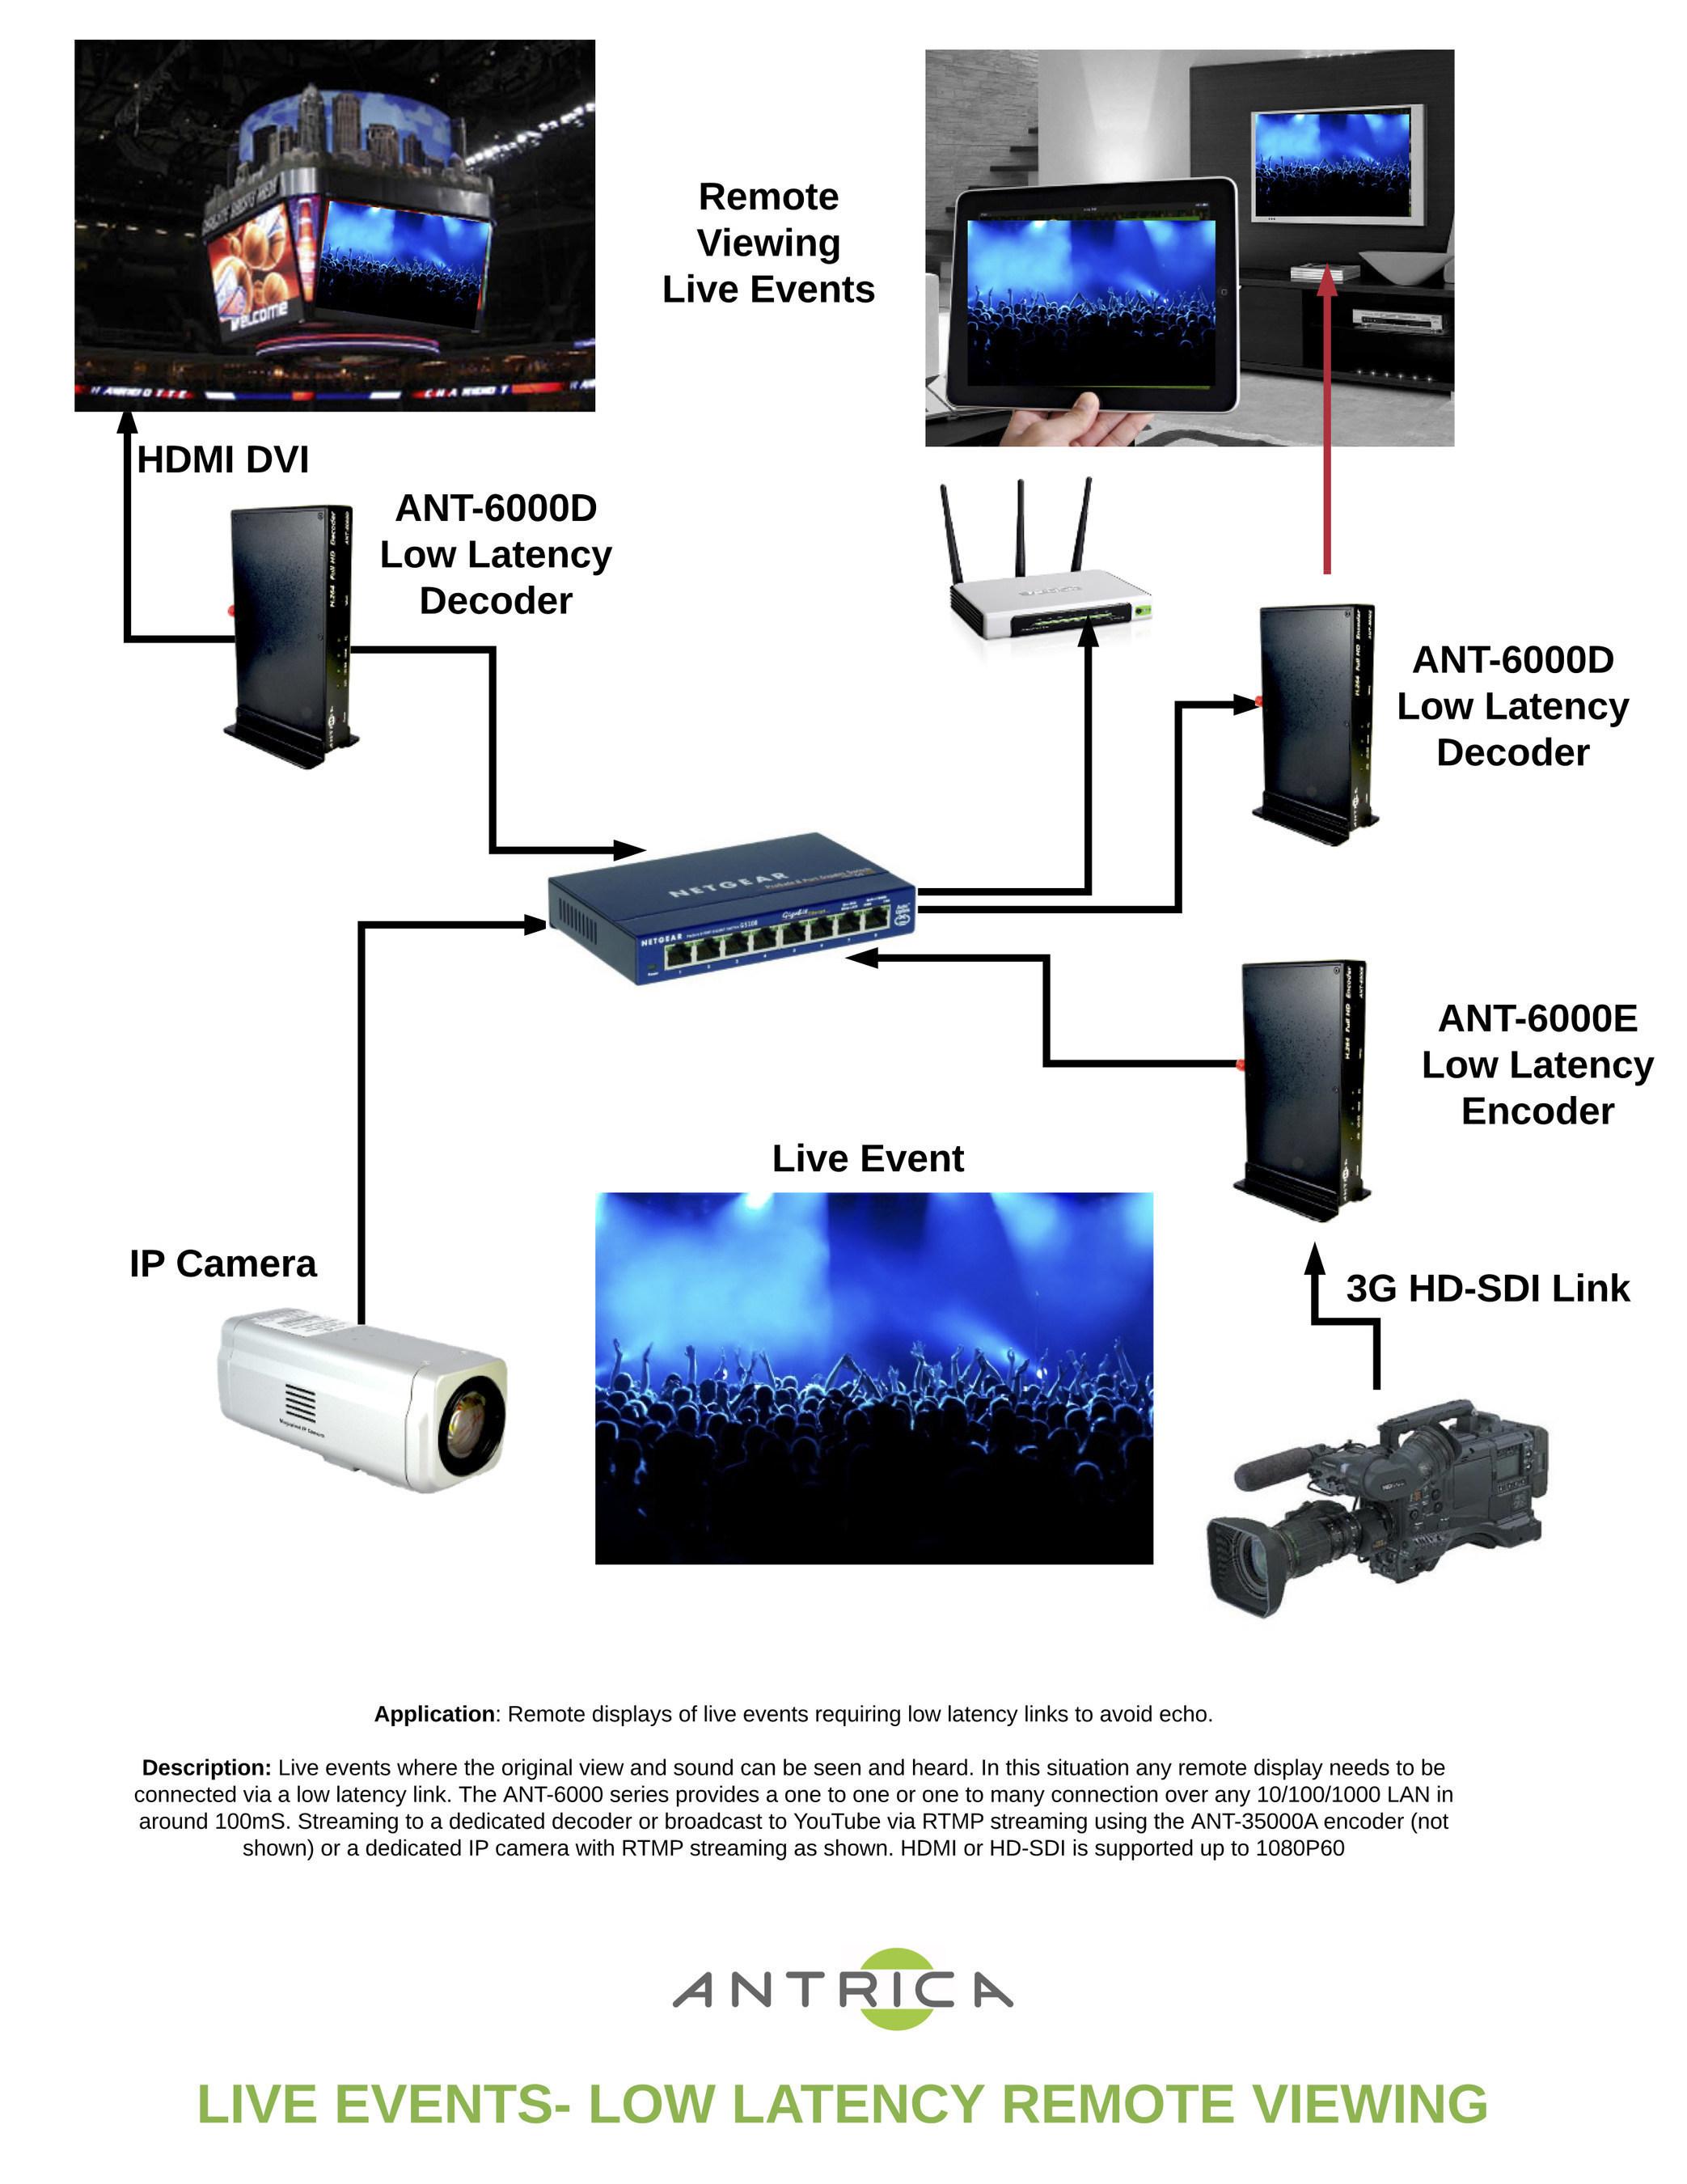 Low Latency Video Encoder & Decoder ANT-6000E&D (PRNewsFoto/Antrica)